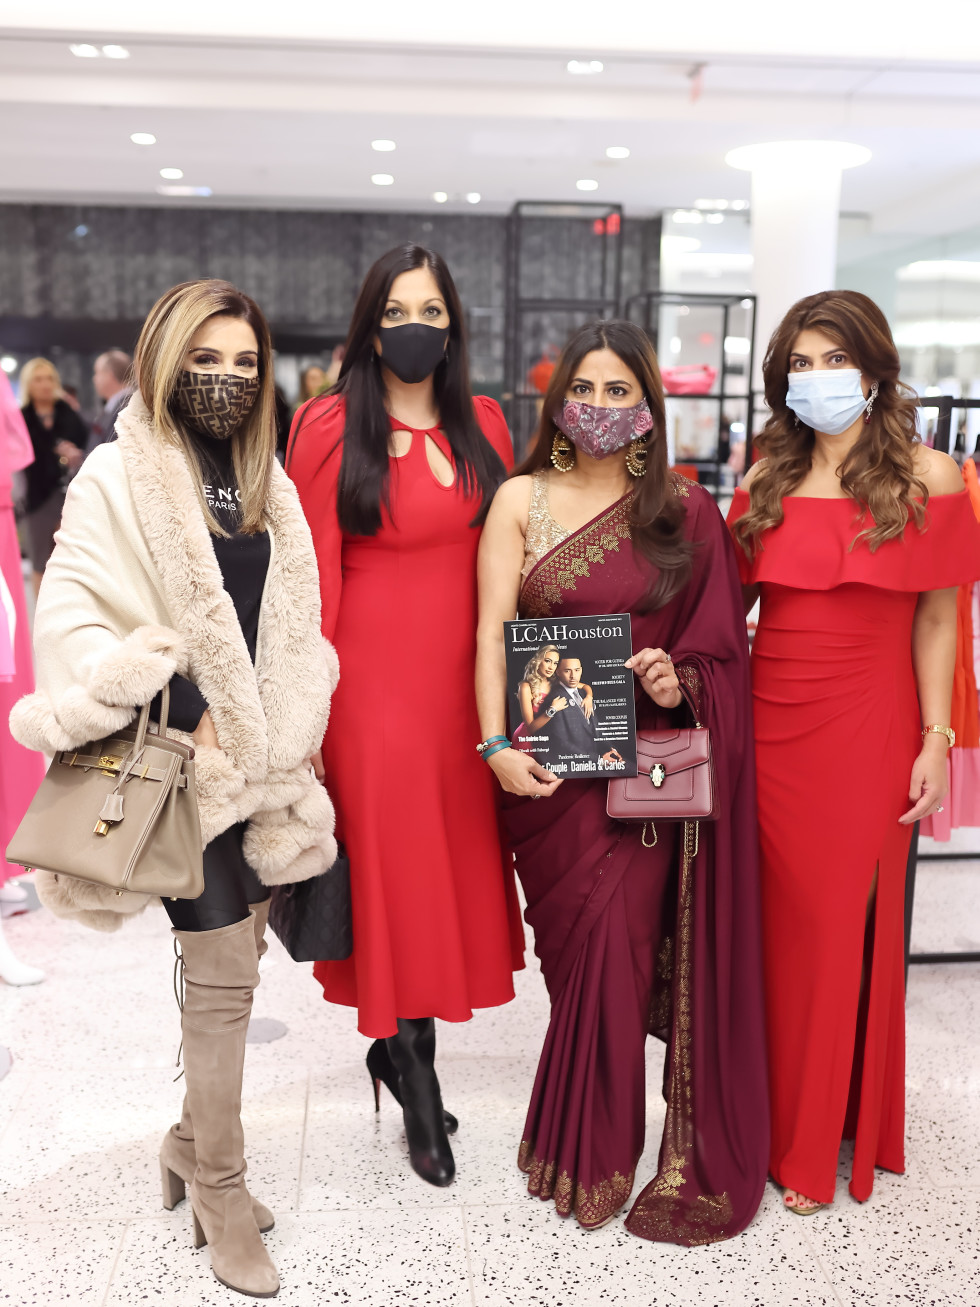 LCA Houston Winter Spring Power Couples 2021 Correa Sneha Merchant, Dr. Sippi Khurana, Ruchi Mukherjee and Namrata Goel